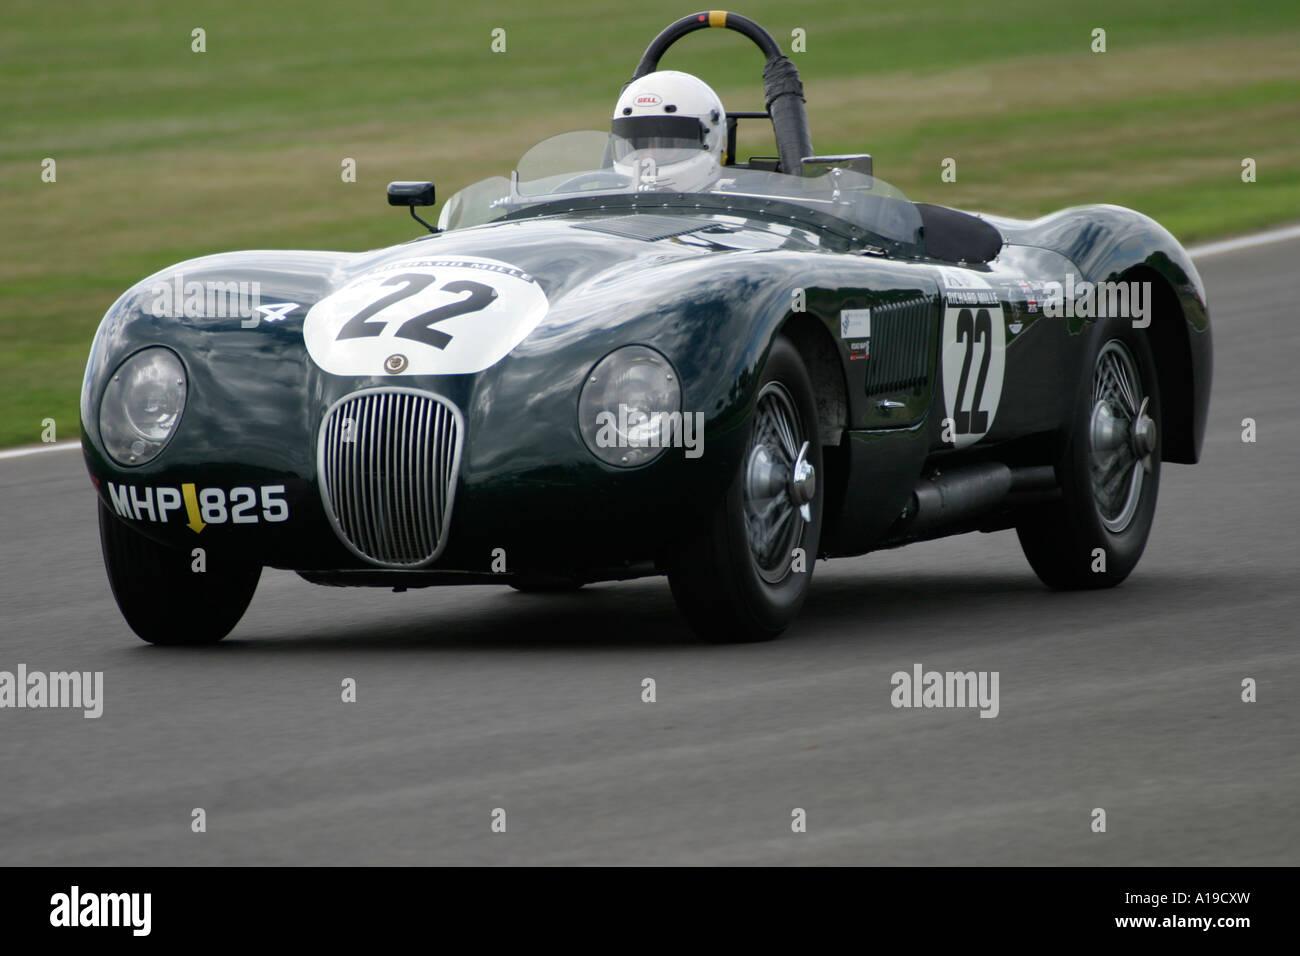 1953 Jaguar C-Type während Freddie März Memorial Trophy-Rennen in Goodwood, Sussex, England. Stockbild